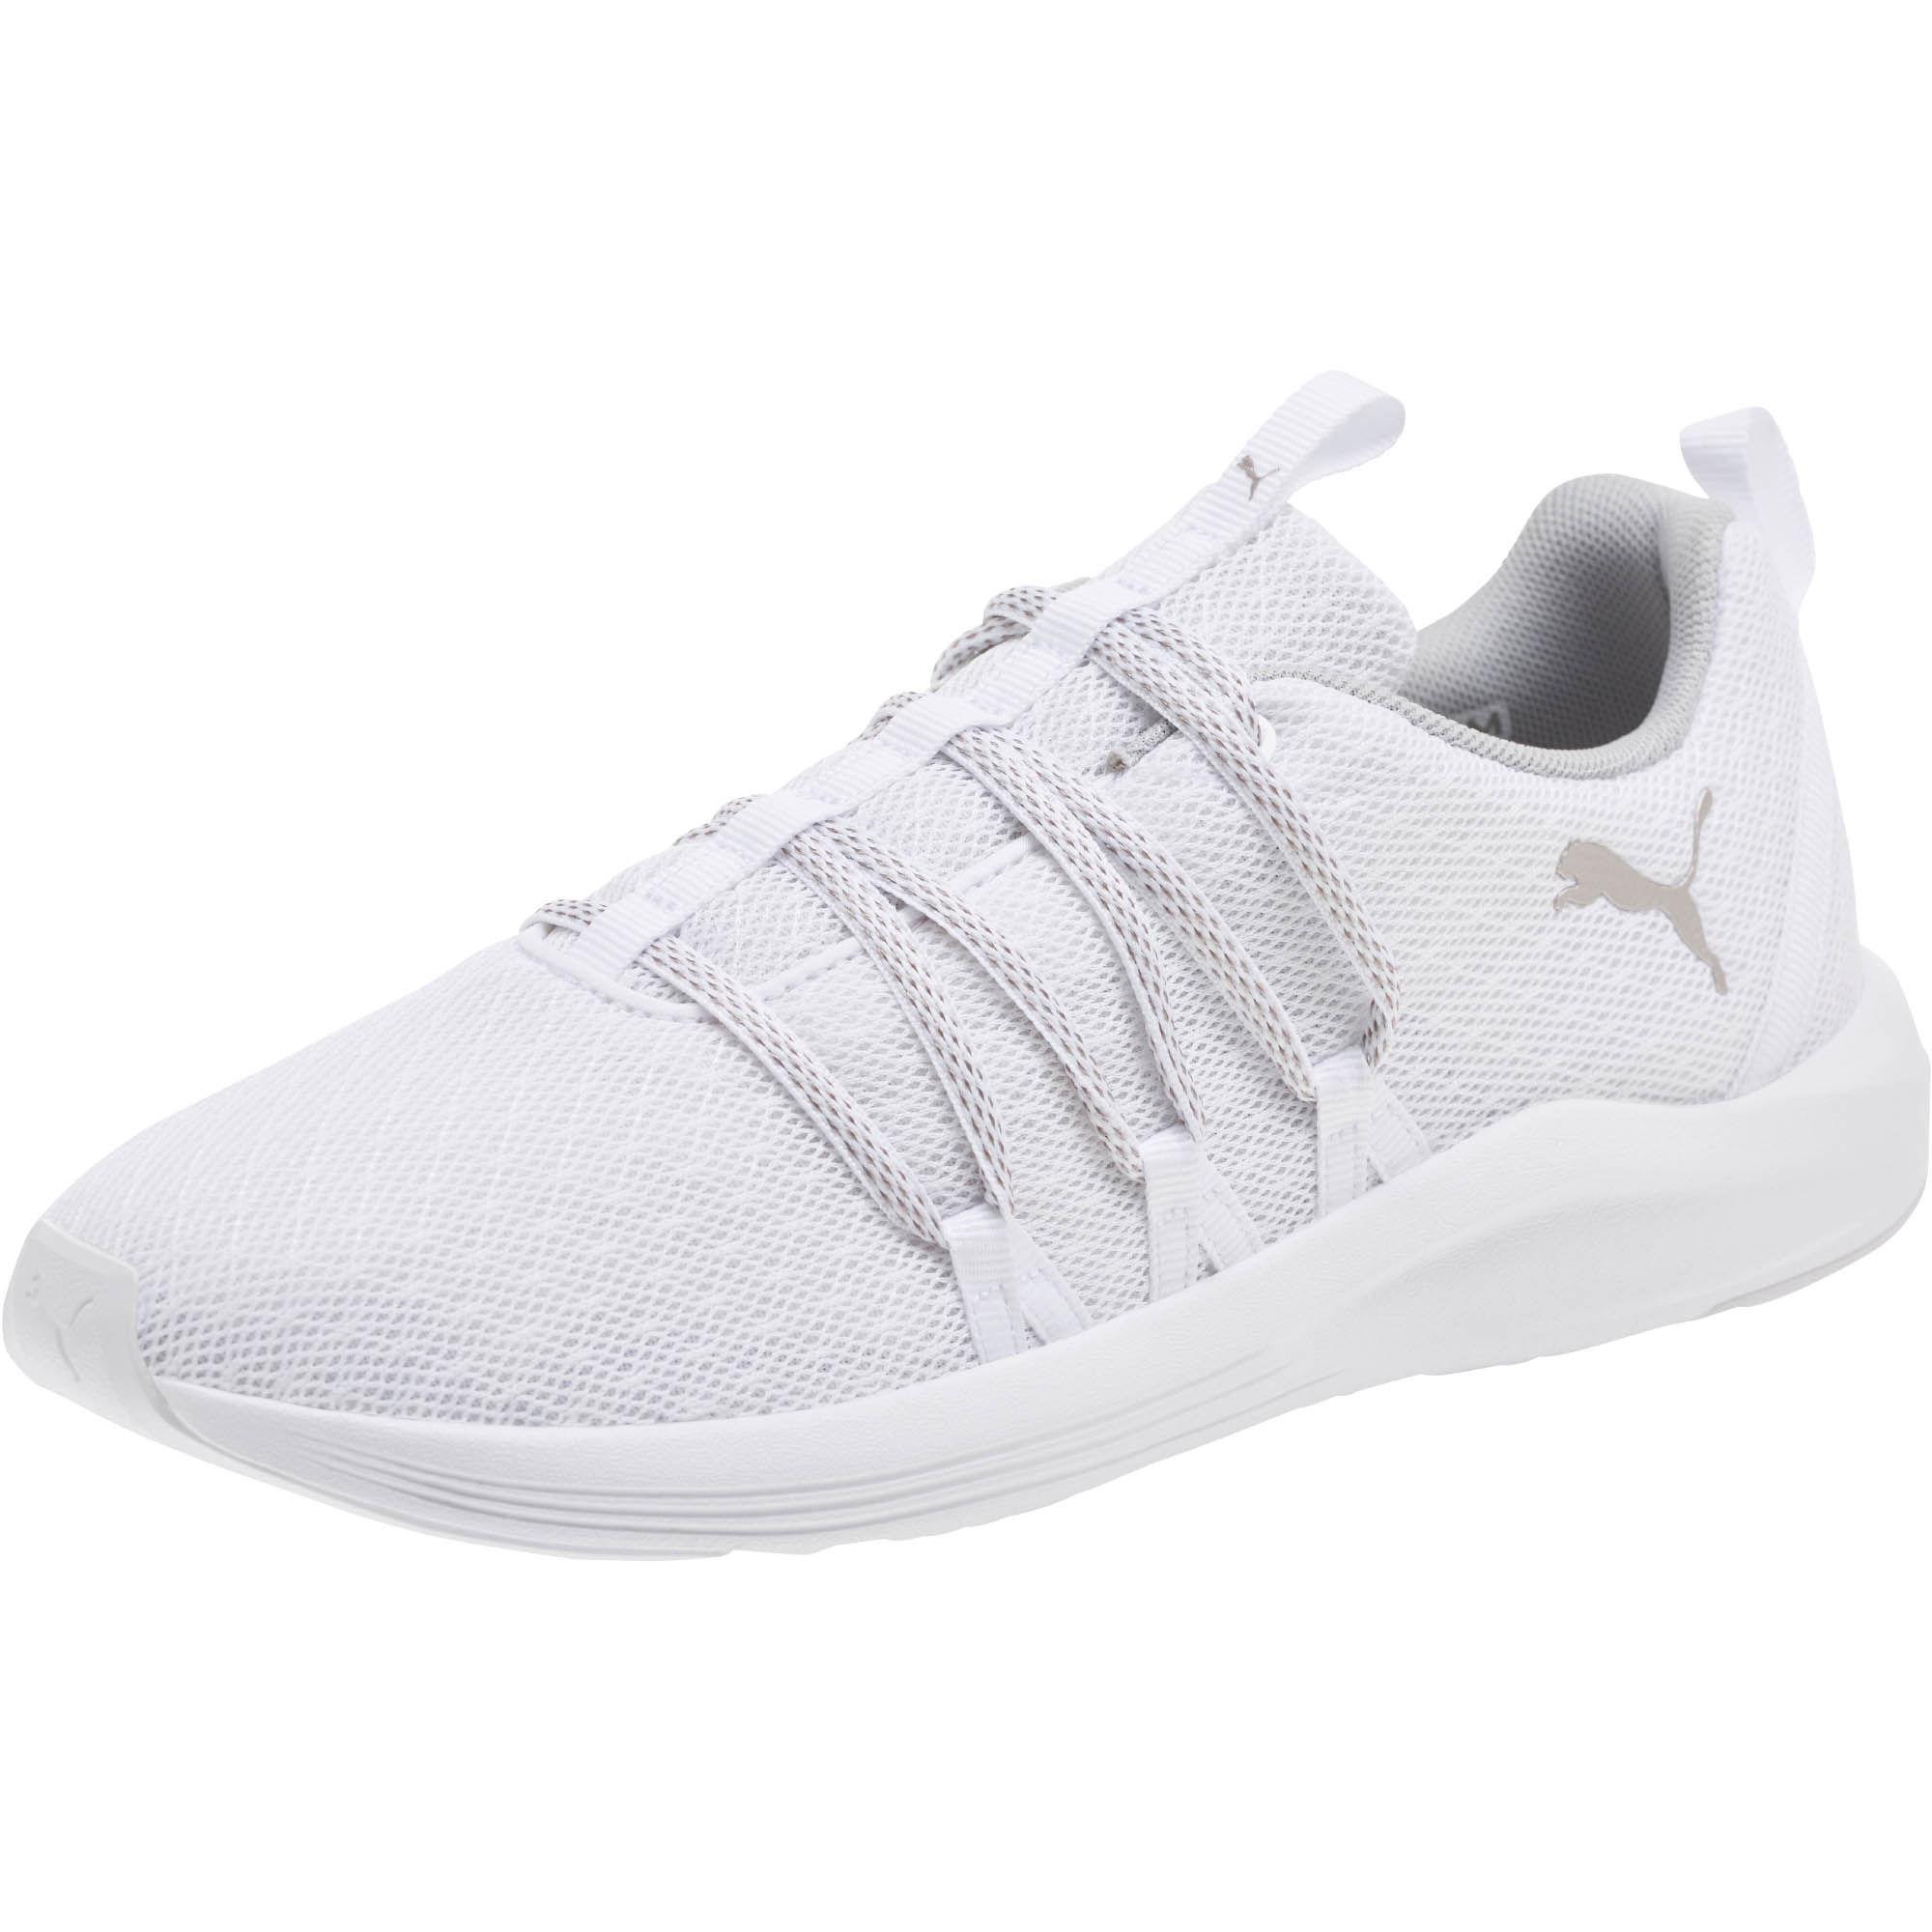 Lyst - PUMA Prowl Alt Knit Mesh Women s Running Shoes in White cd5a882d1